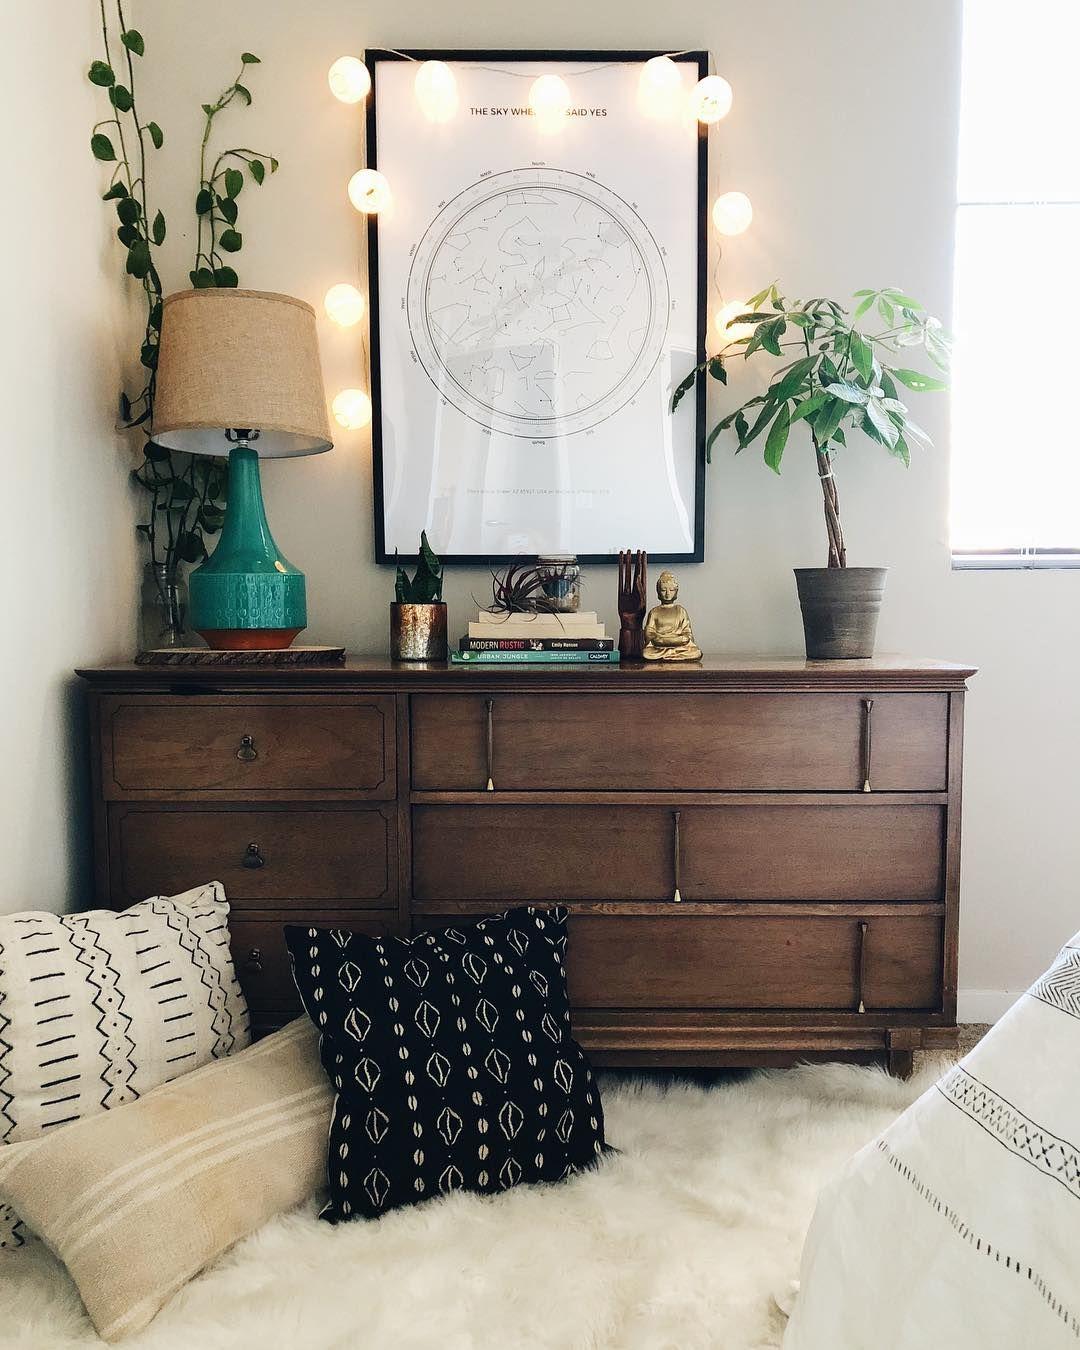 Pin de Zara Woodbridge en Home Interior   Pinterest   Dormitorio ...